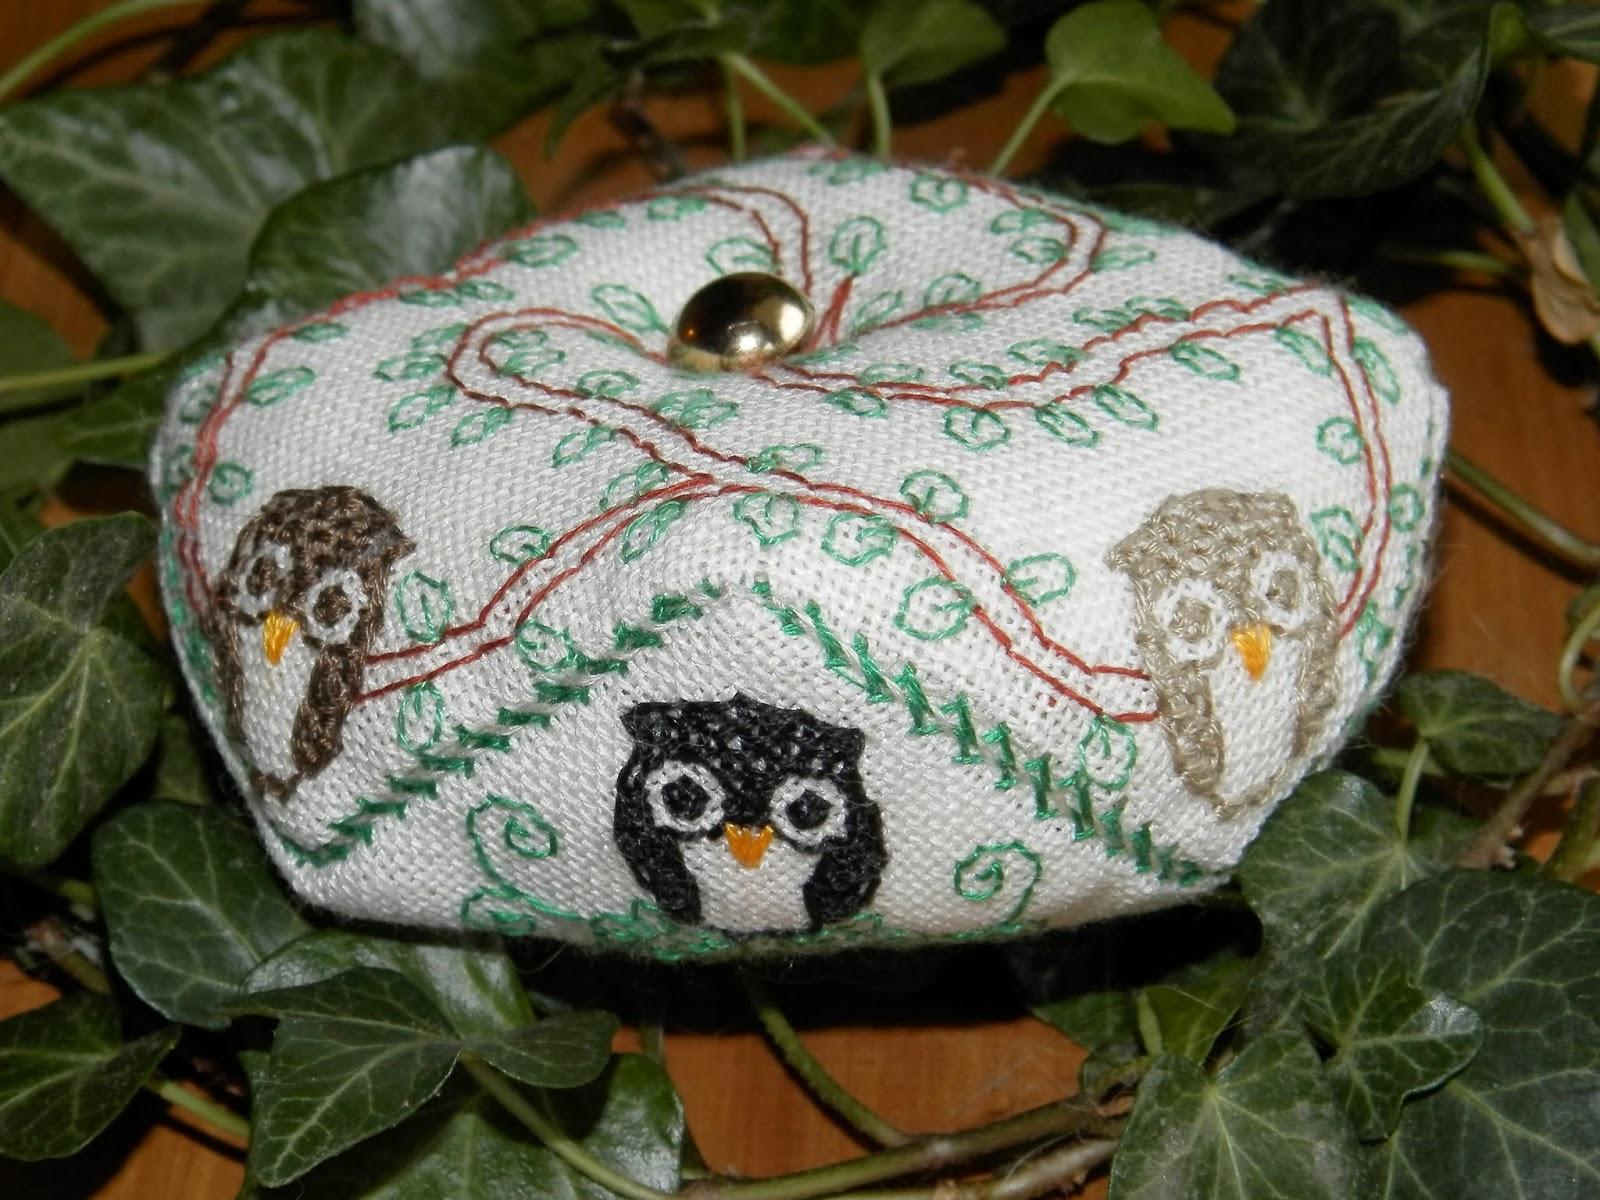 http://boutique-brodeuse-bressane.blogspot.fr/2013/10/biscornu-owl.html